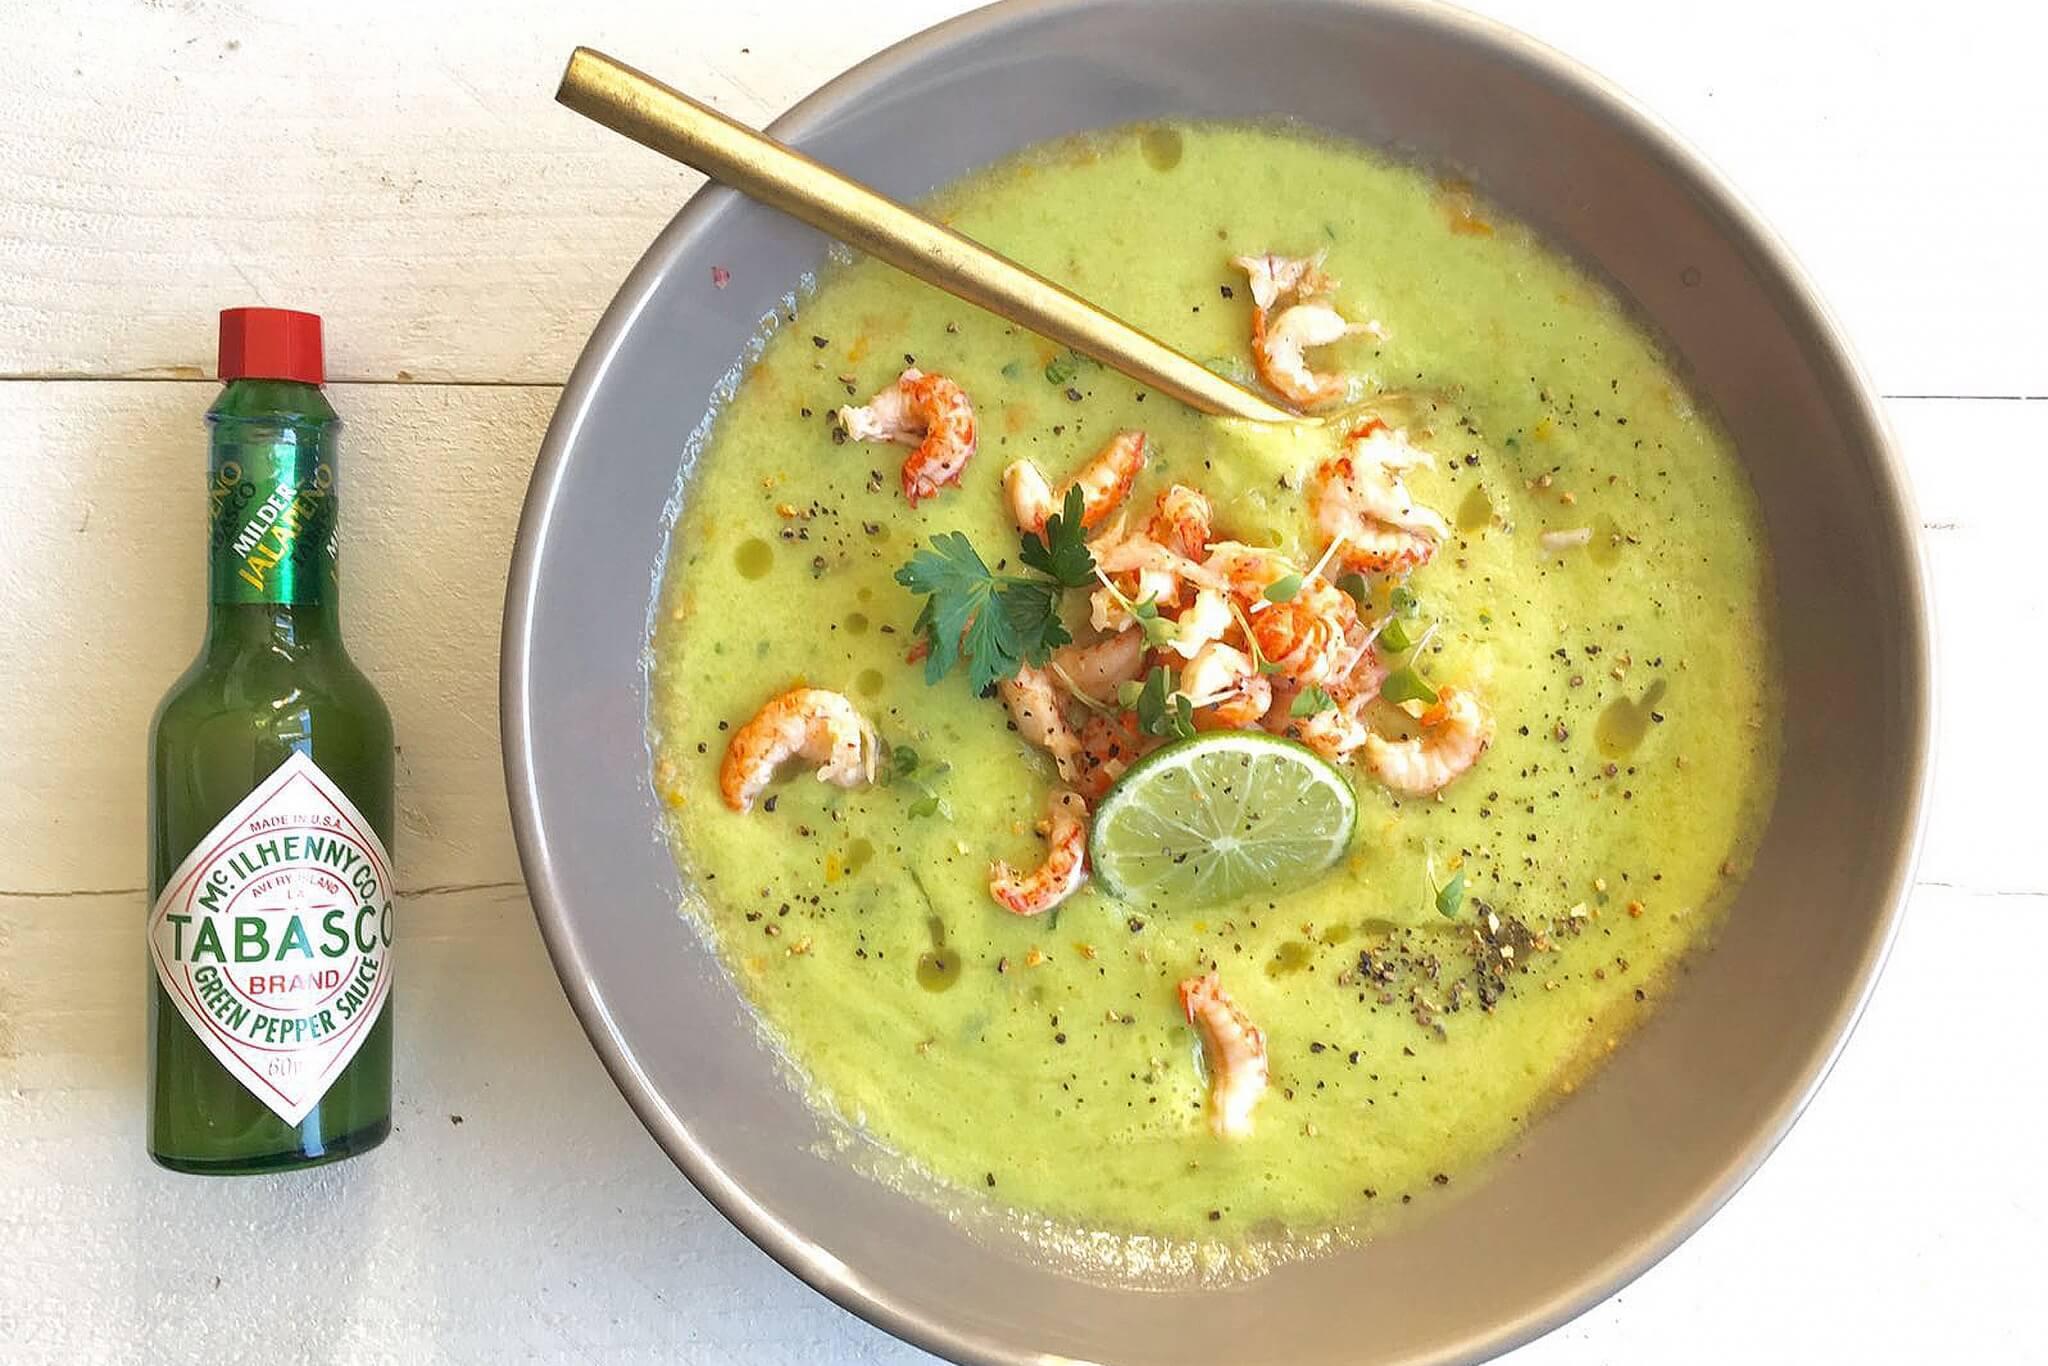 Groene gazpacho met rivierkreeftjes en Tabasco